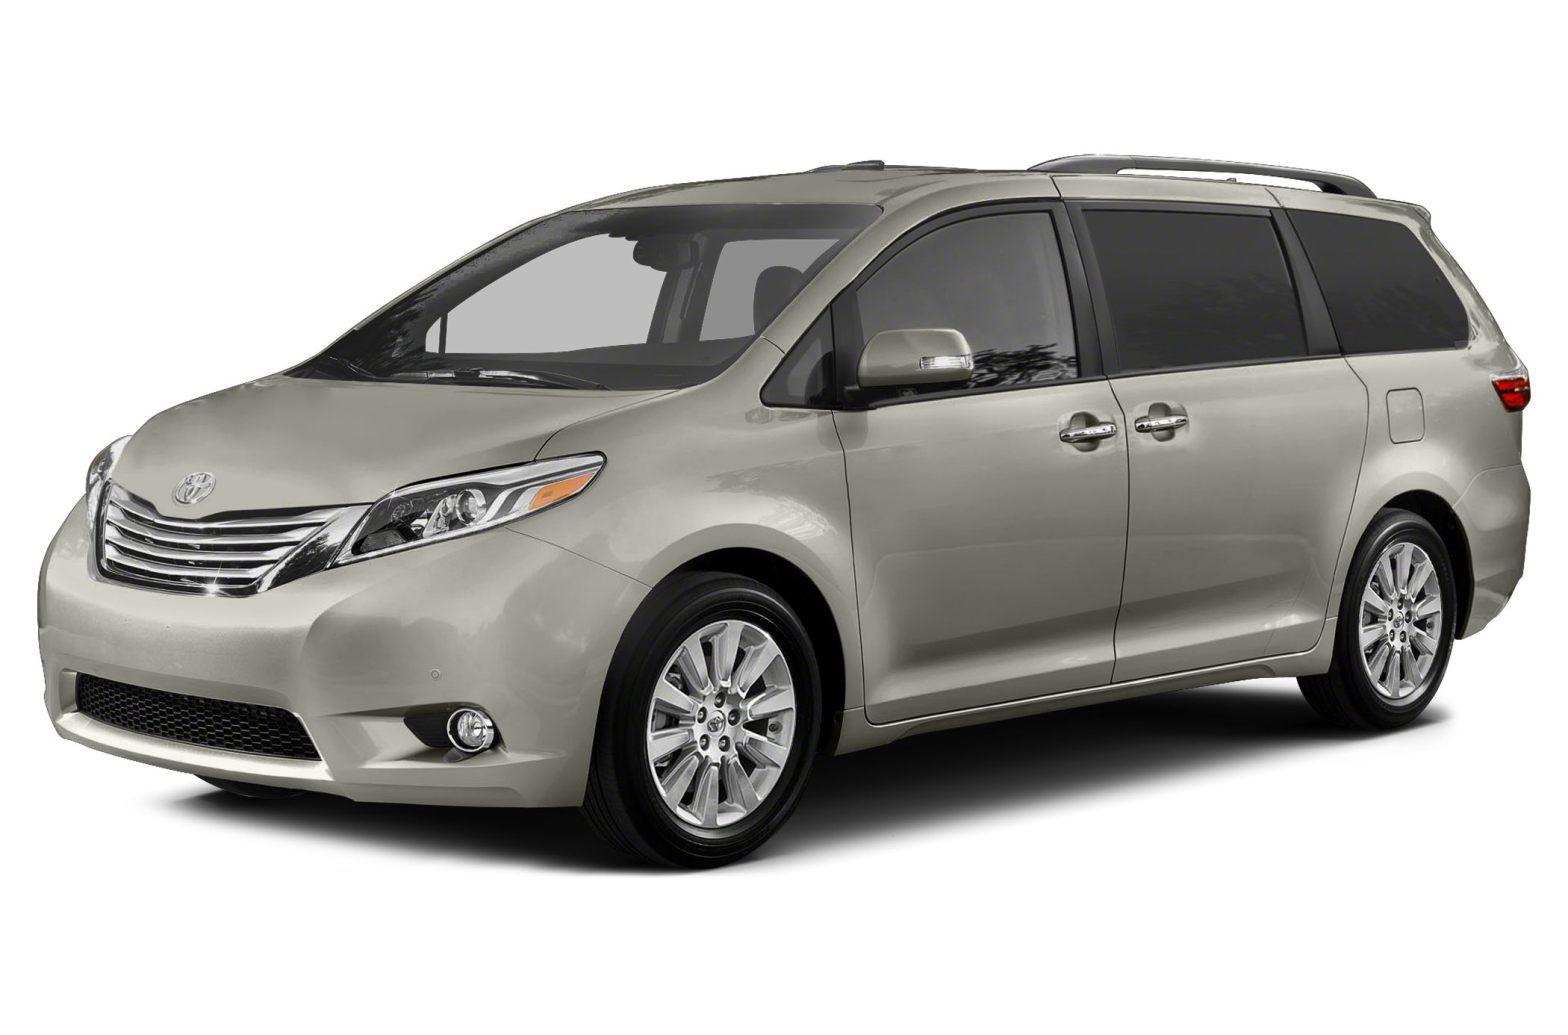 Toyota Sienna Family Safety Thomasville